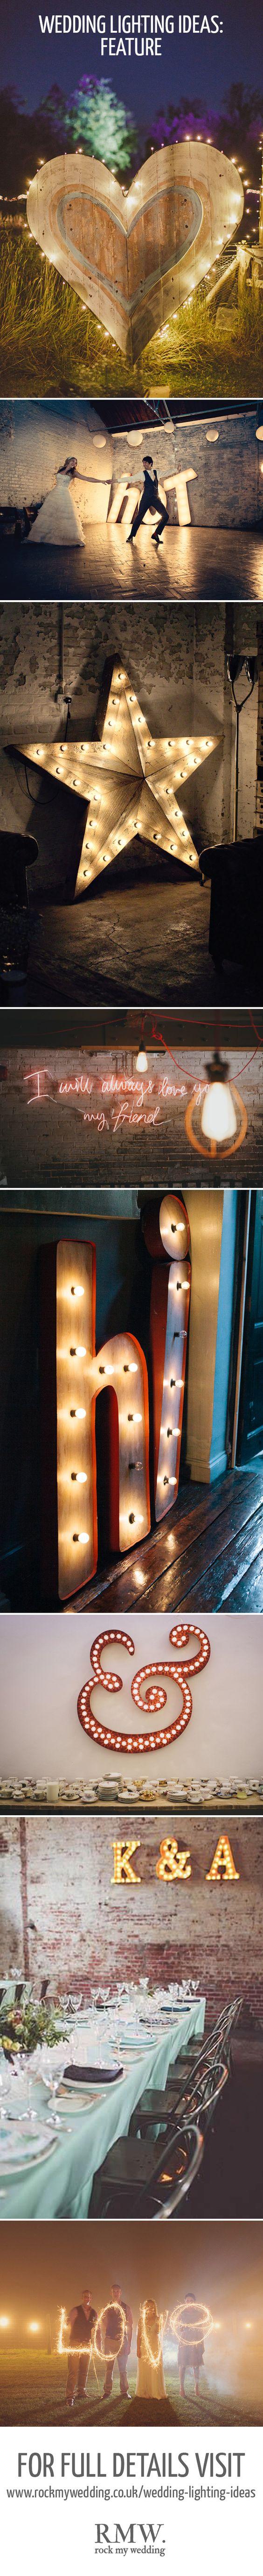 Feature Lighting At Weddings   http://www.rockmywedding.co.uk/gorgeous-lighting-ideas-wedding-day/